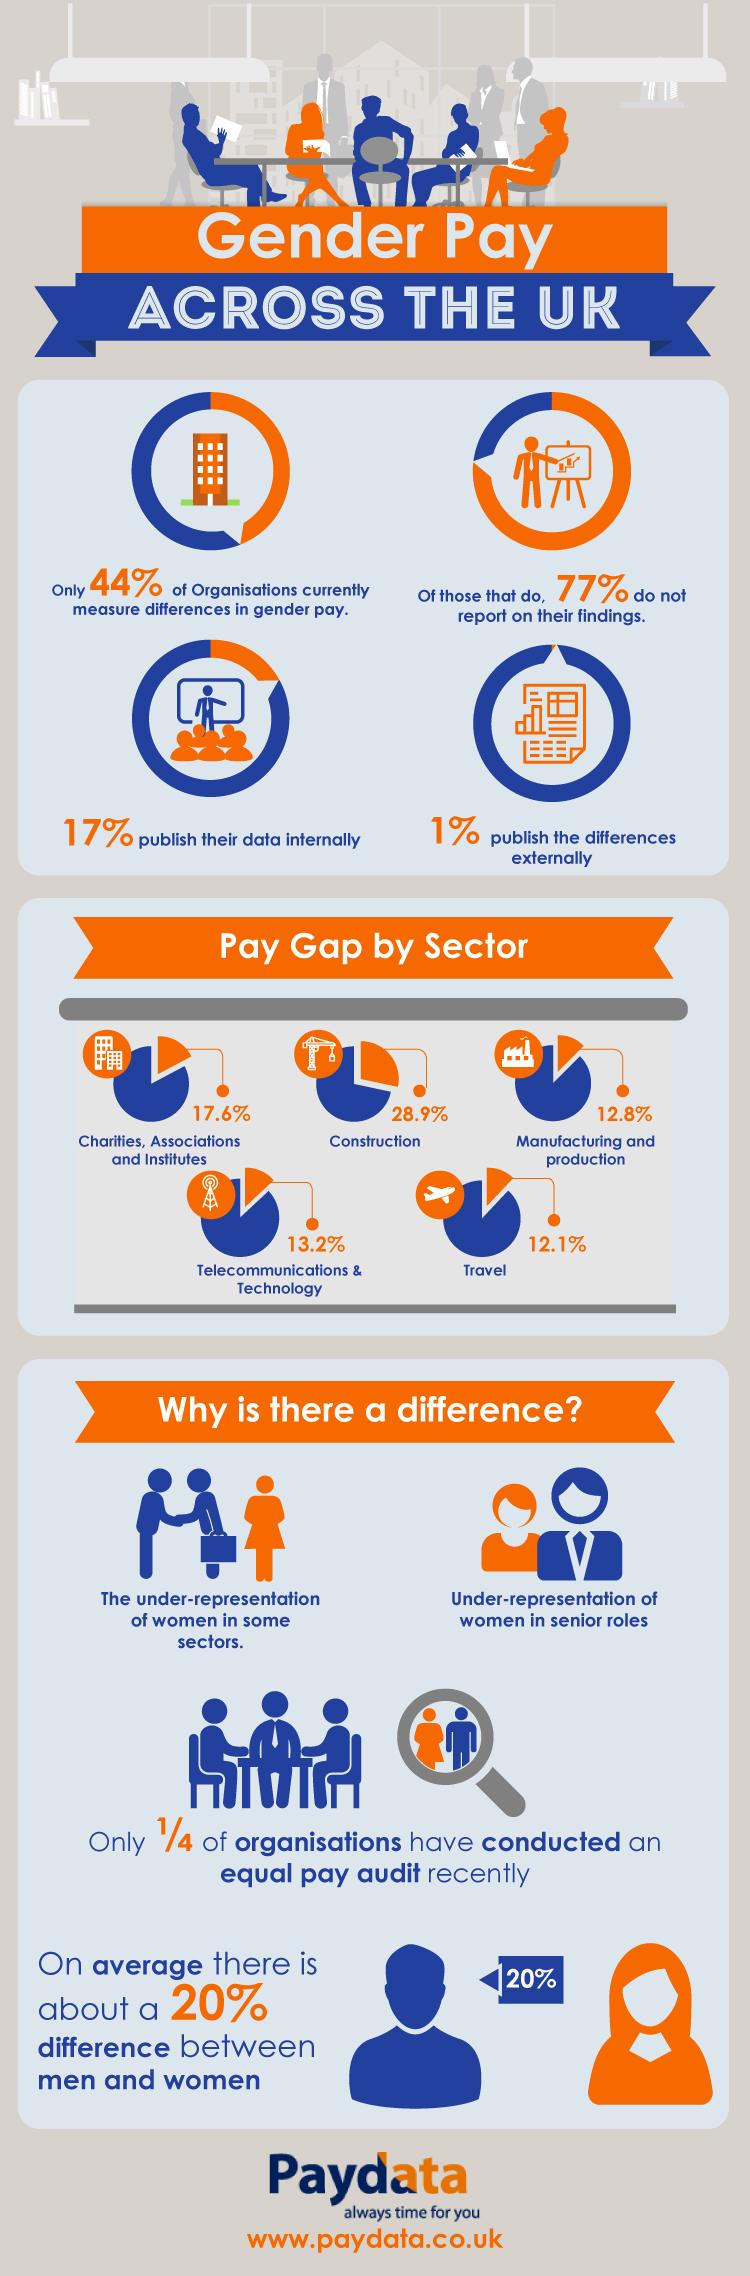 paydata-infographic